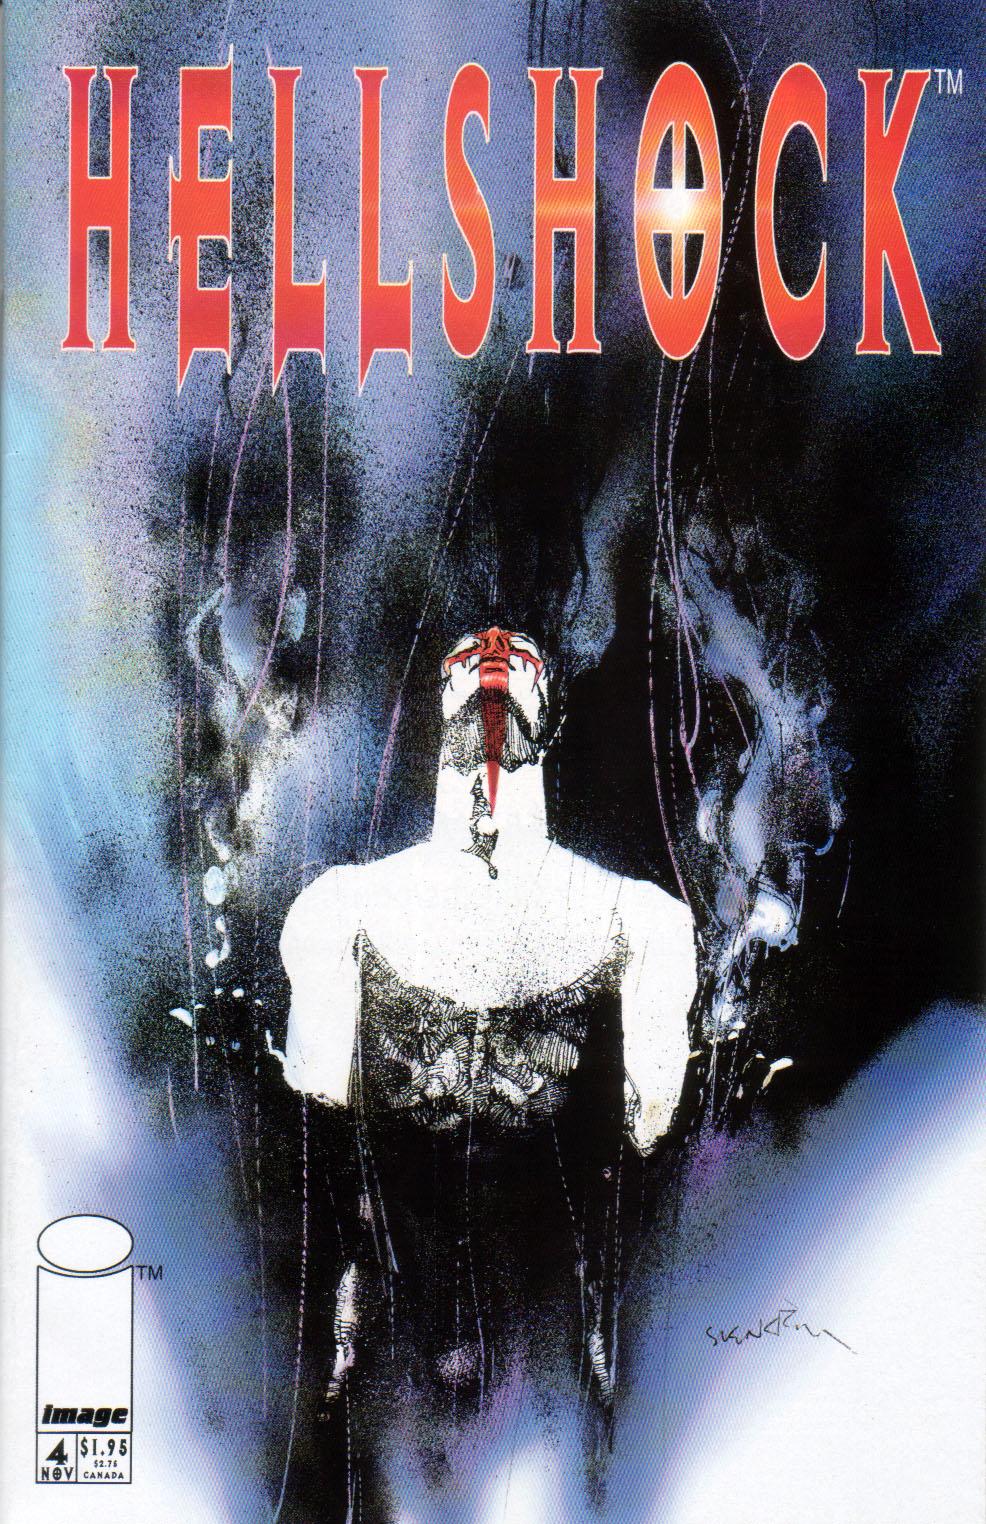 Read online Hellshock comic -  Issue #4 - 2